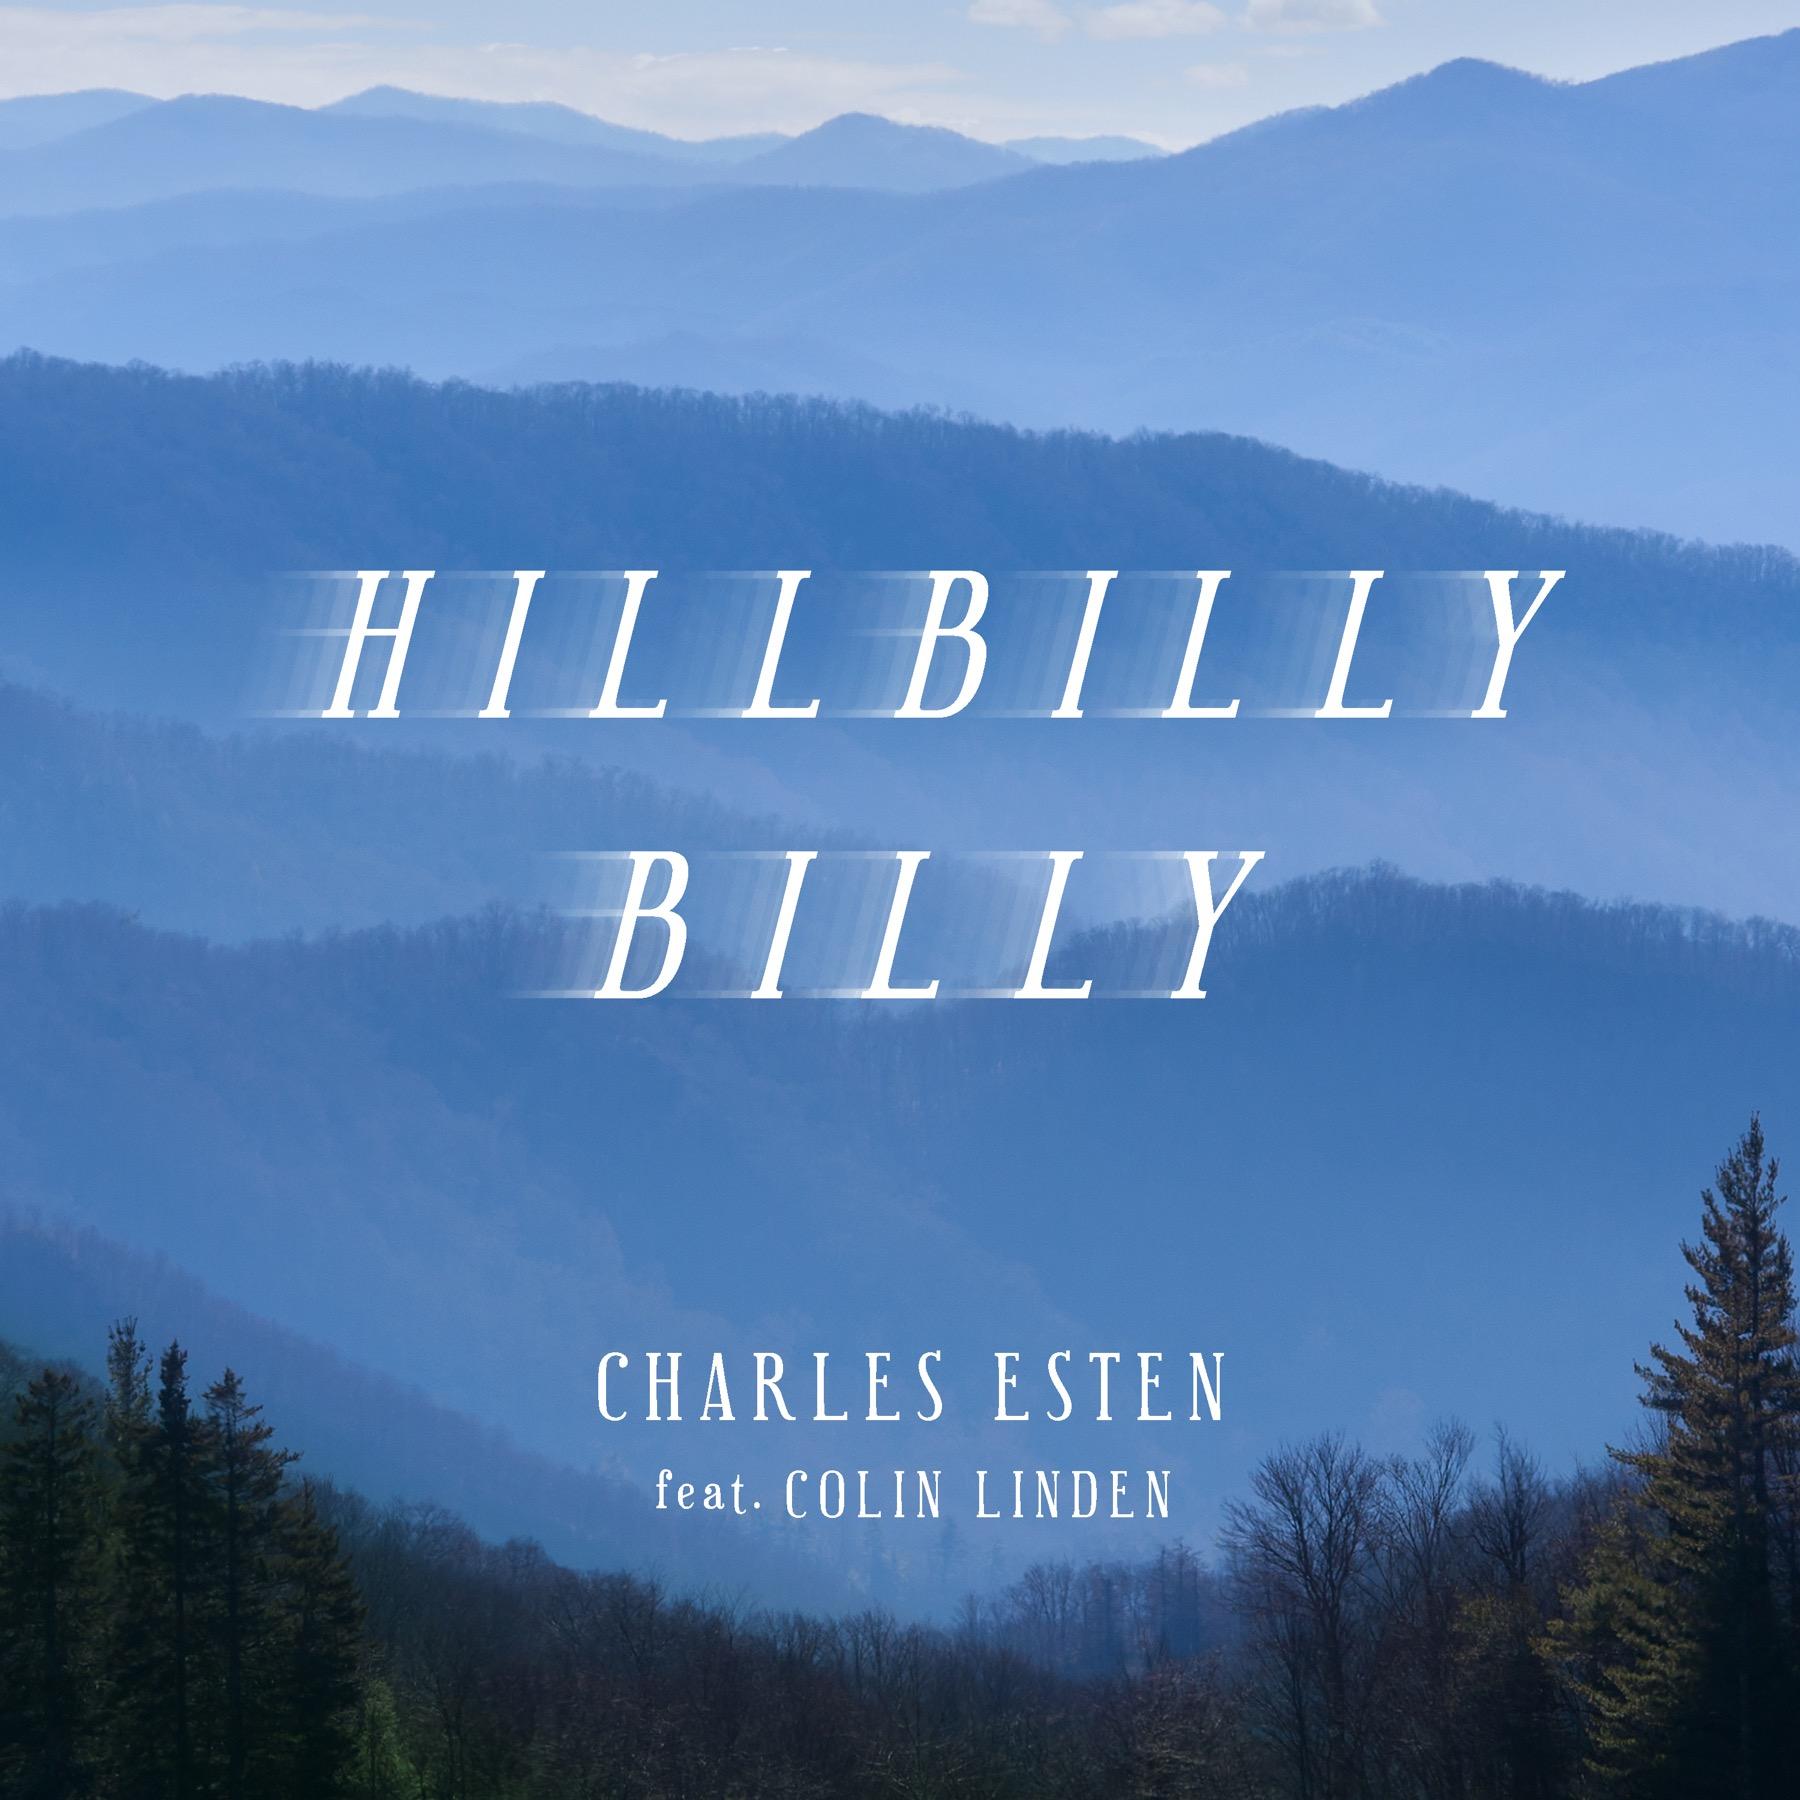 Hillbilly Billy